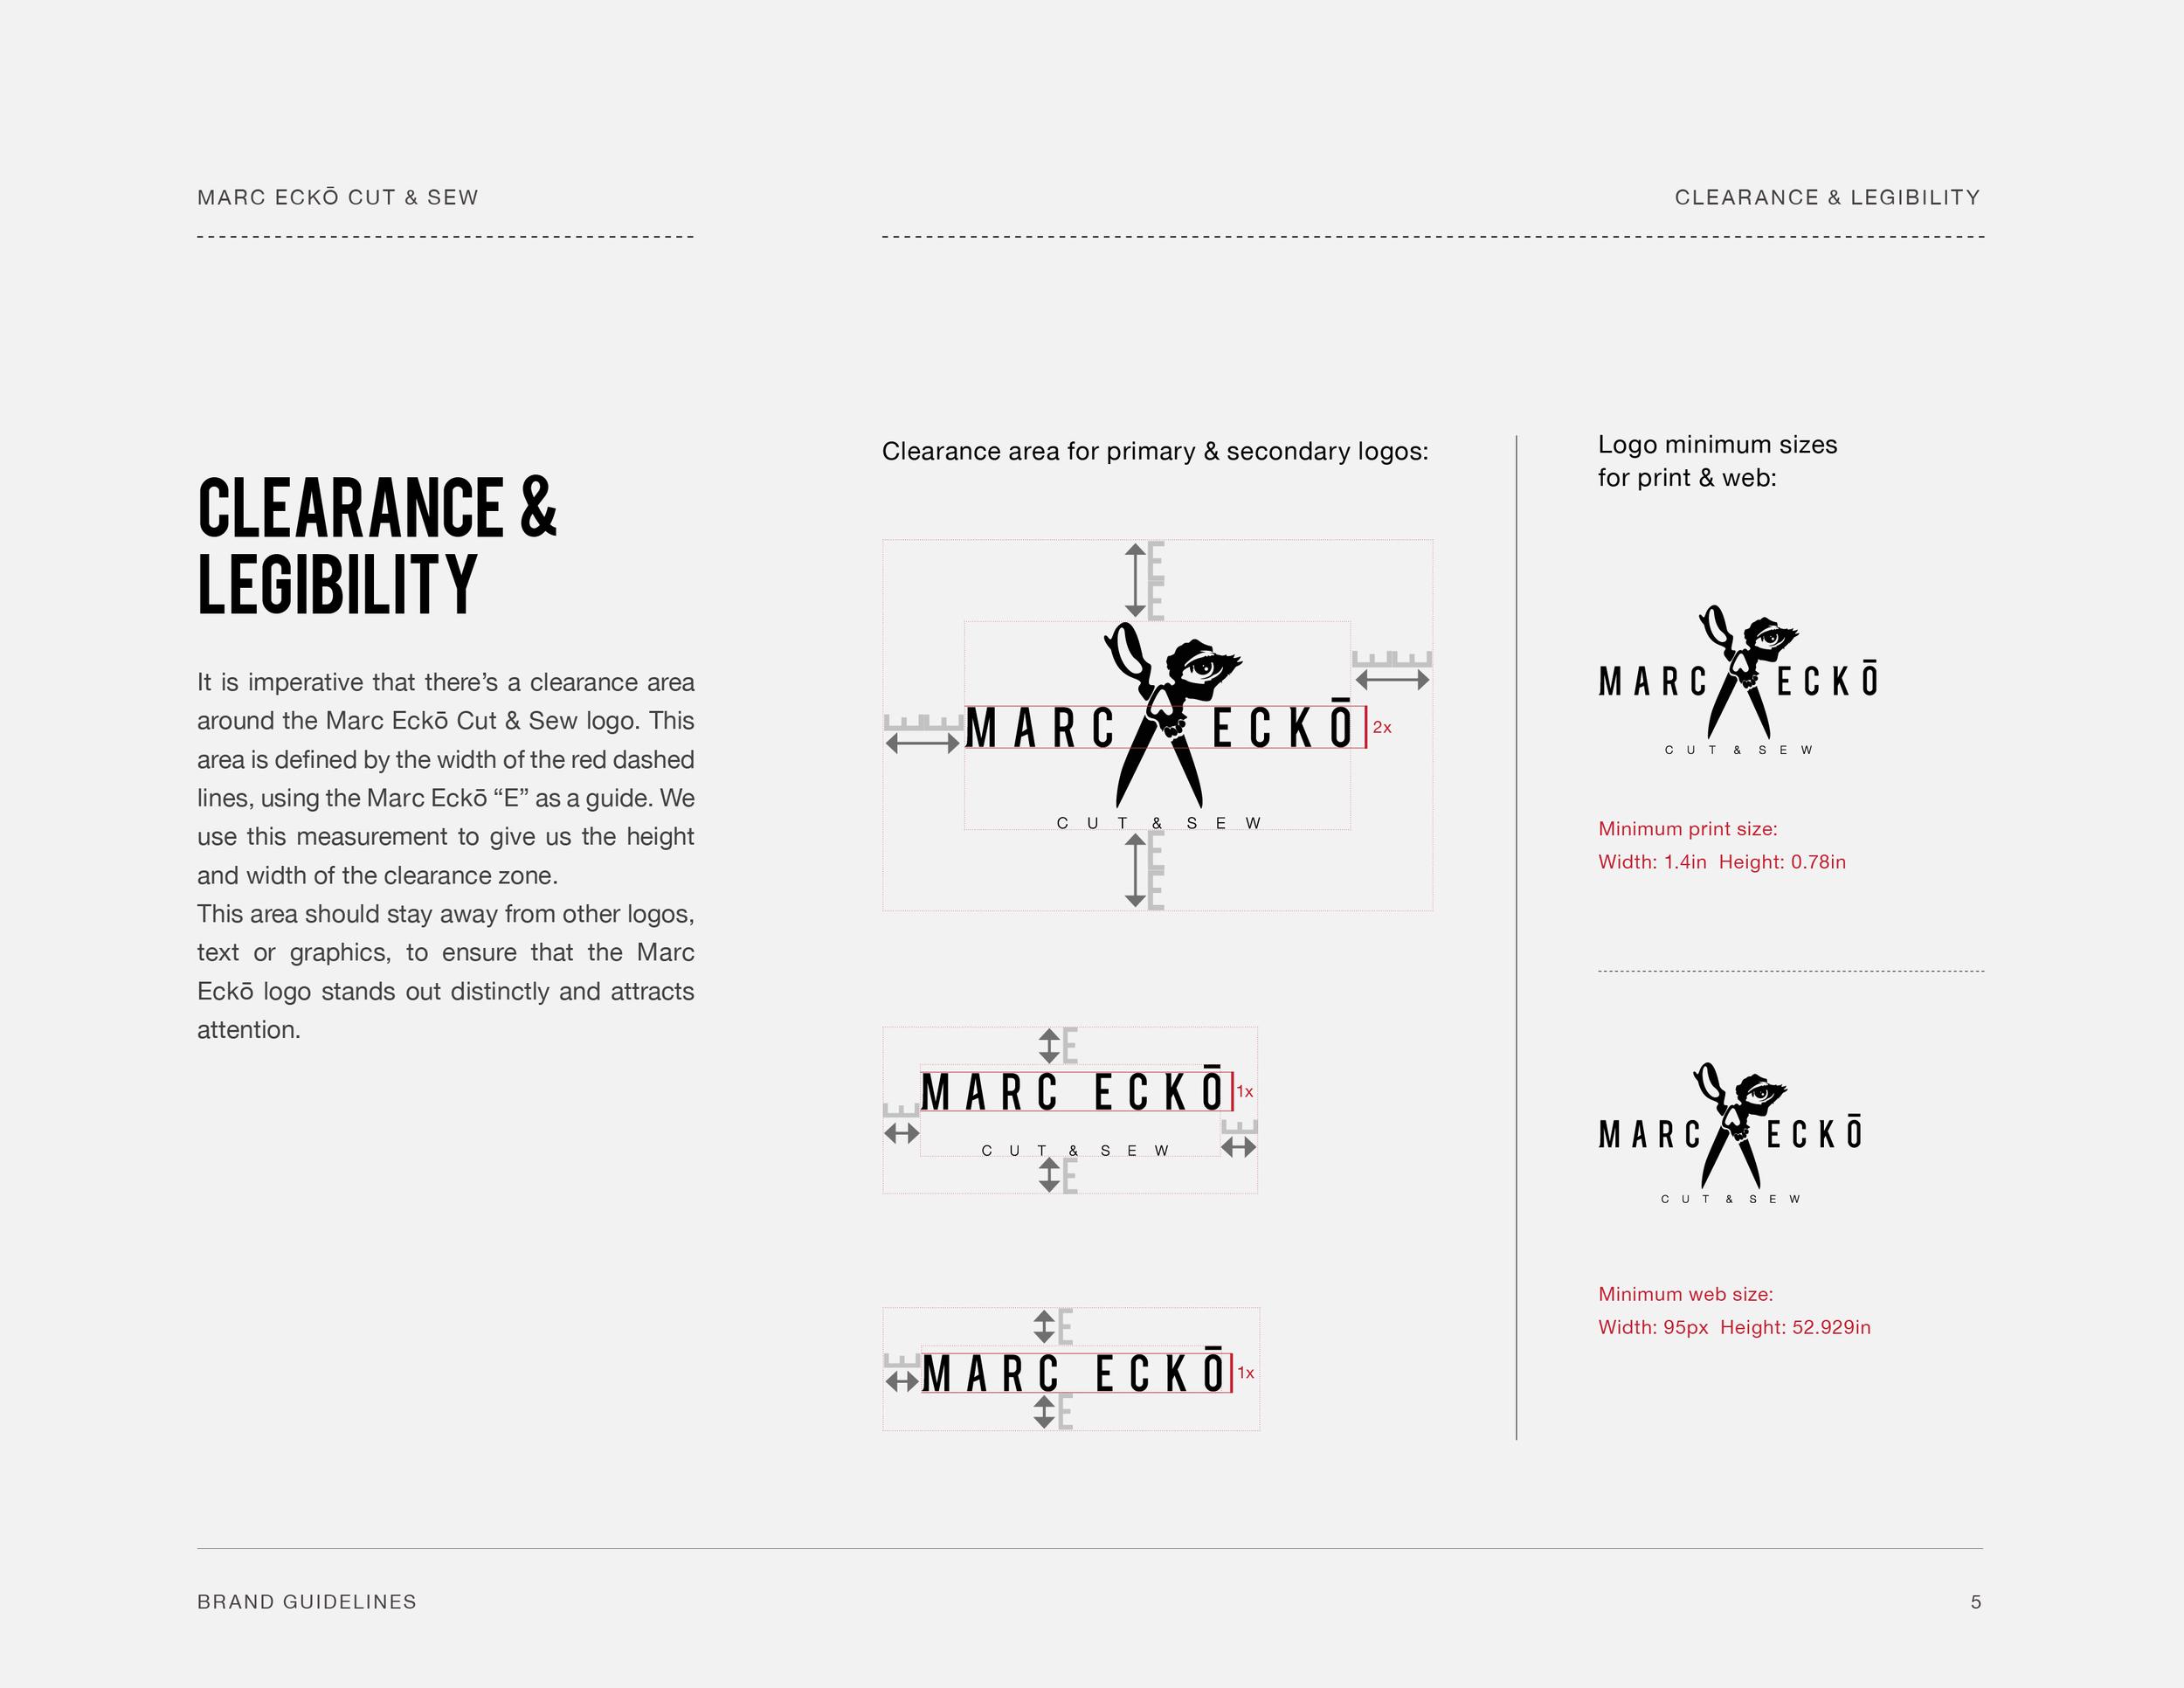 Marc-Ecko-brand-guidelines8.jpg